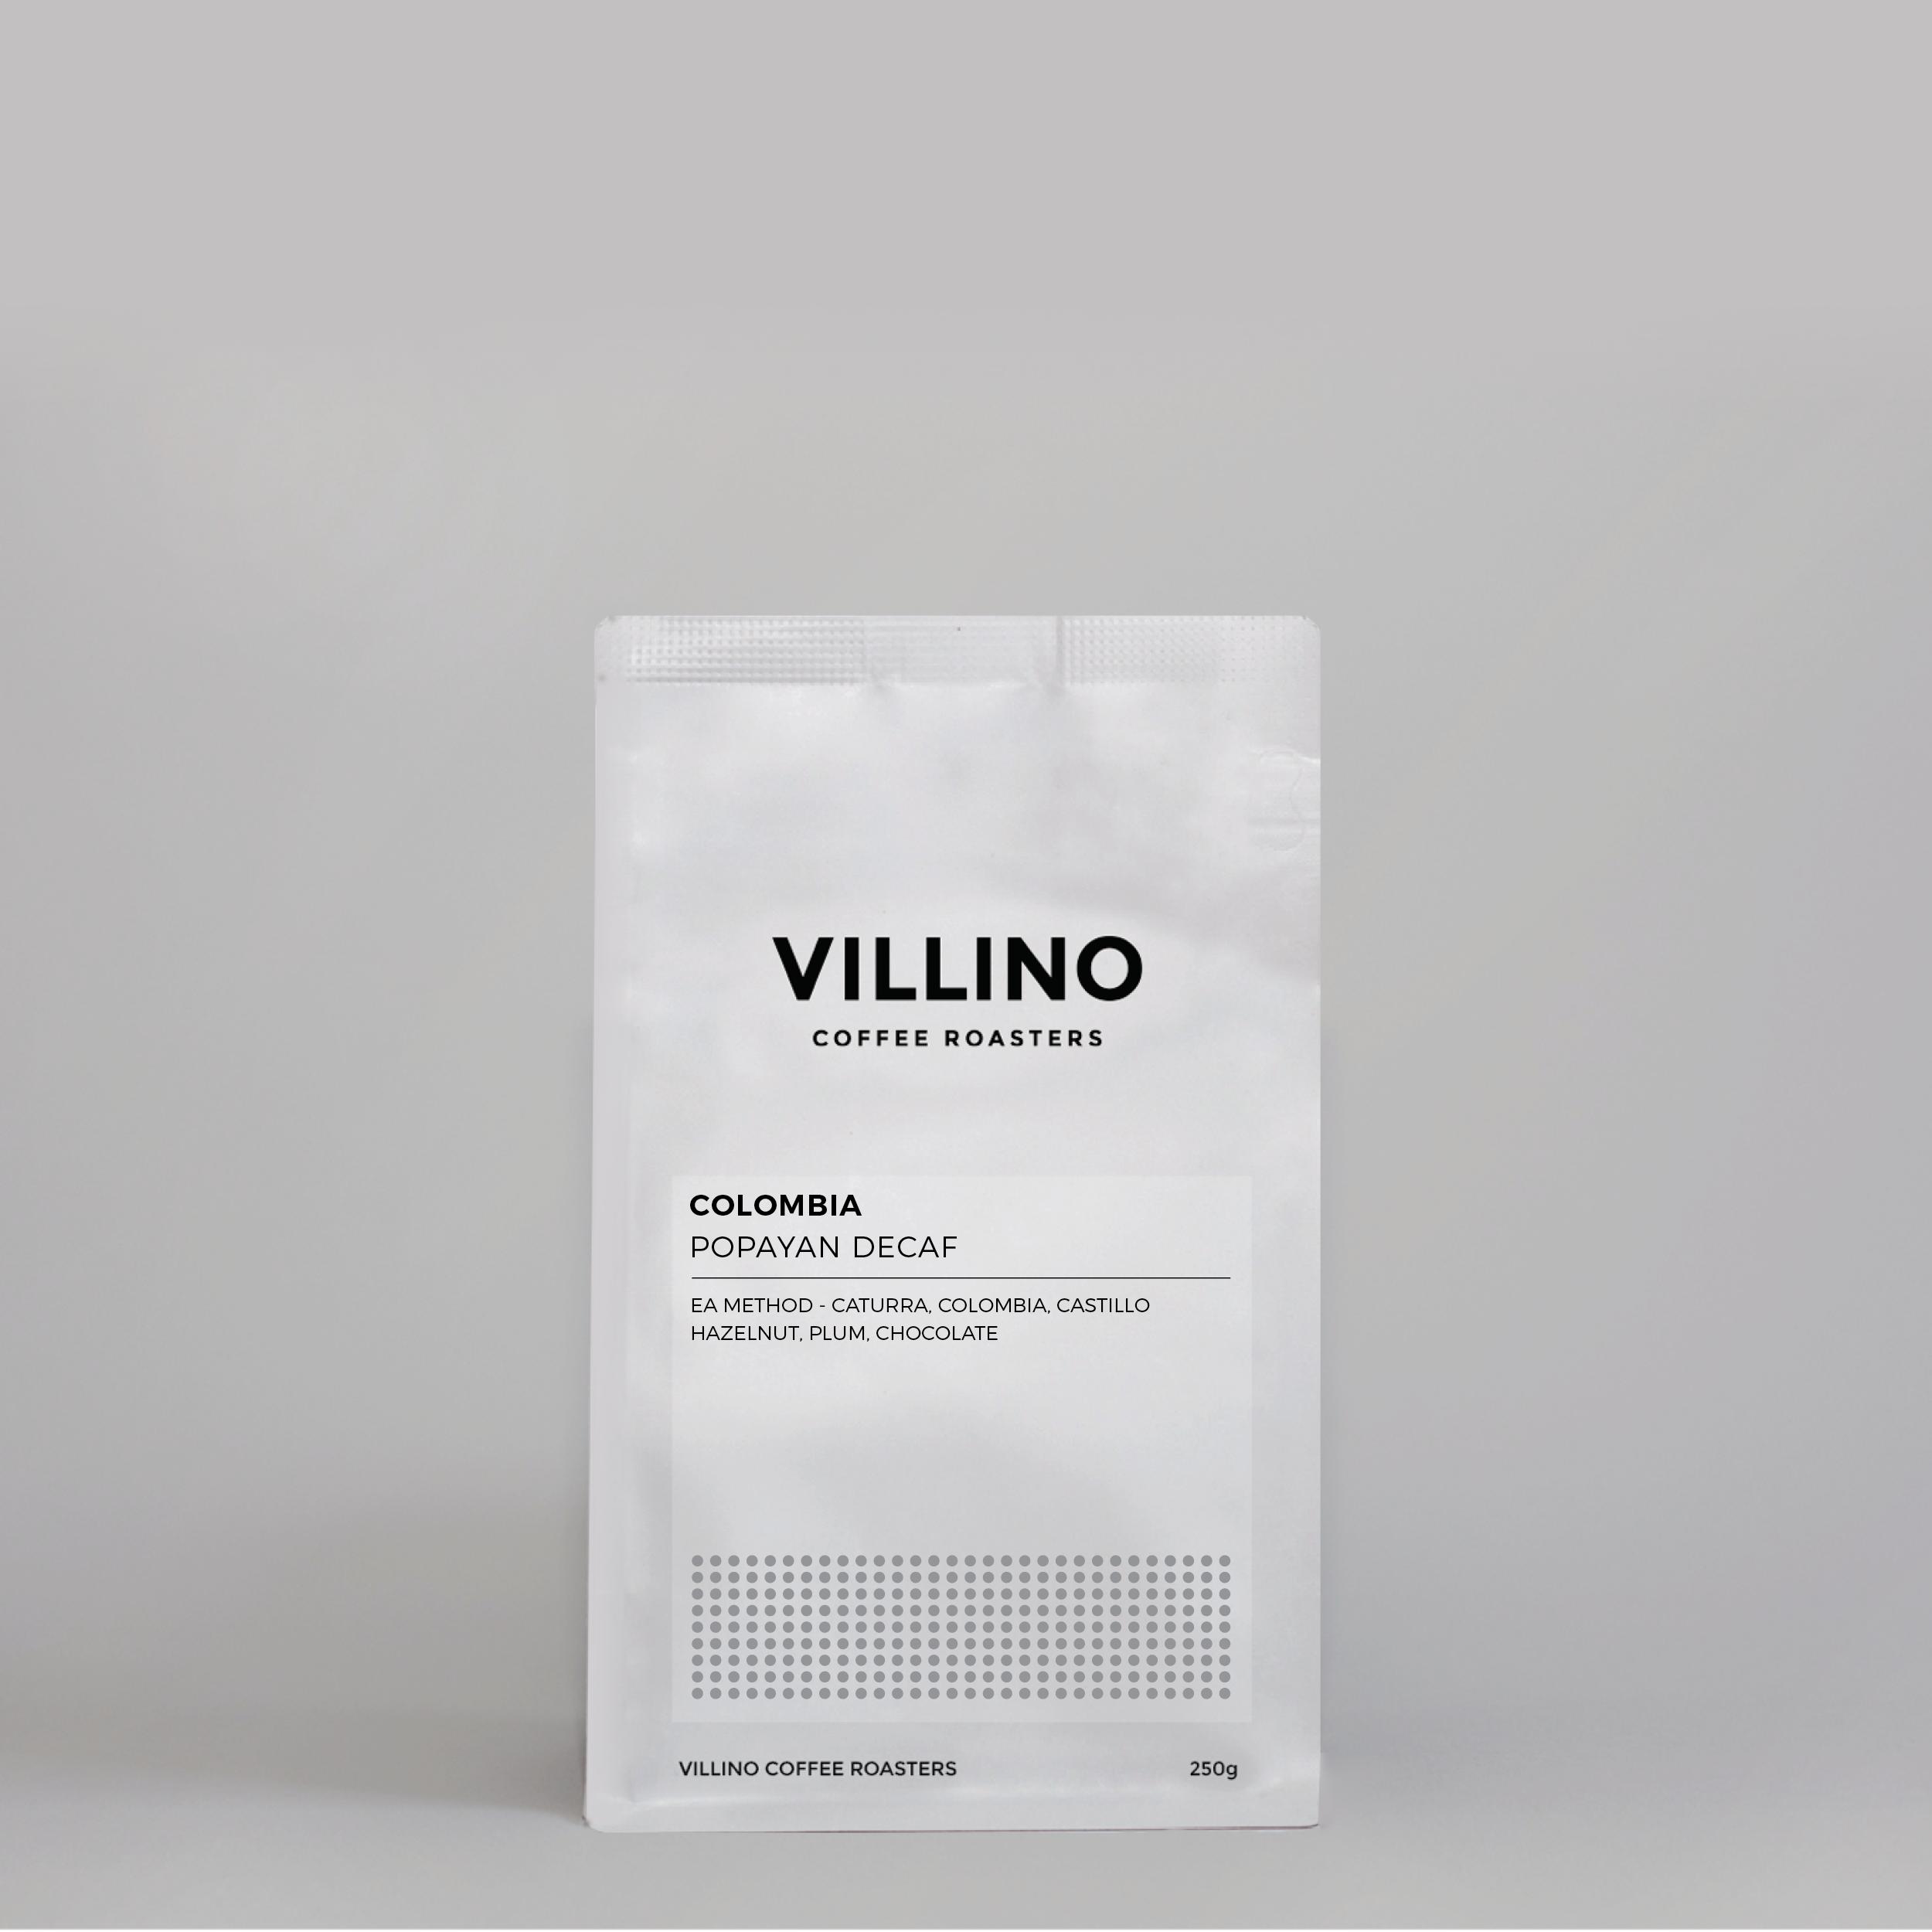 Villino_Retail Bag Popayan Decaf_600x600px.png